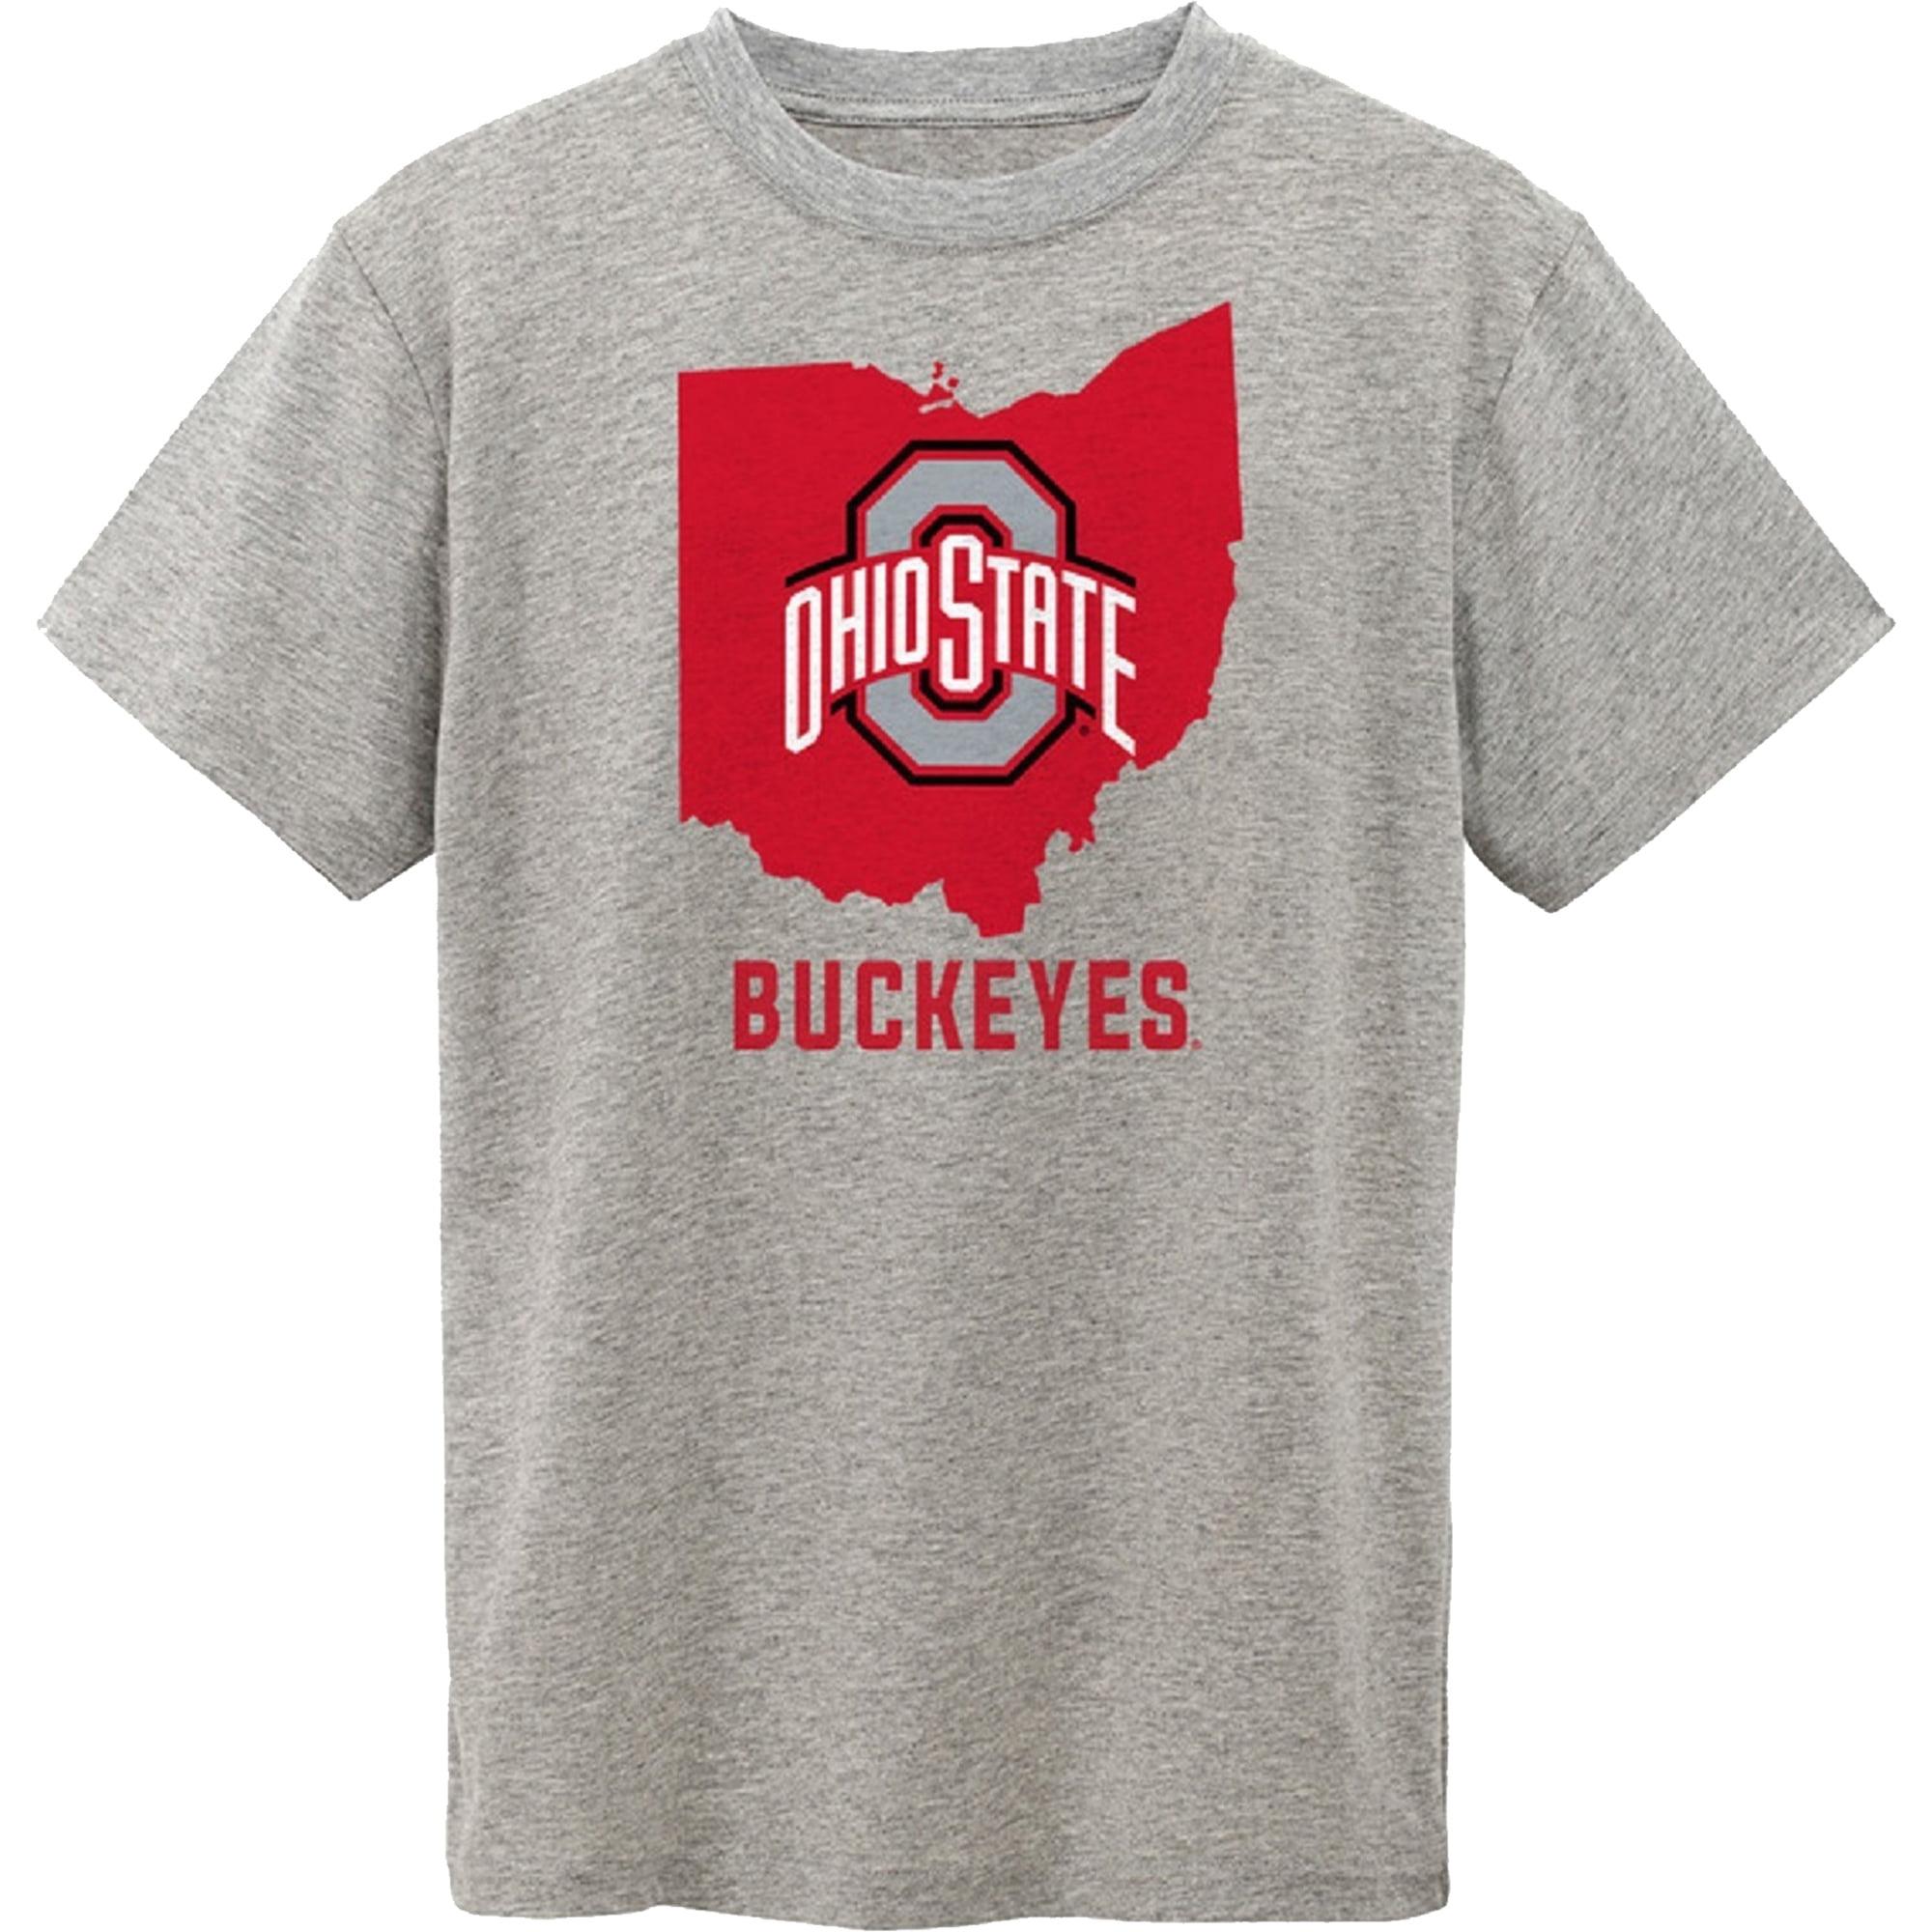 Youth Gray Ohio State Buckeyes State T-Shirt